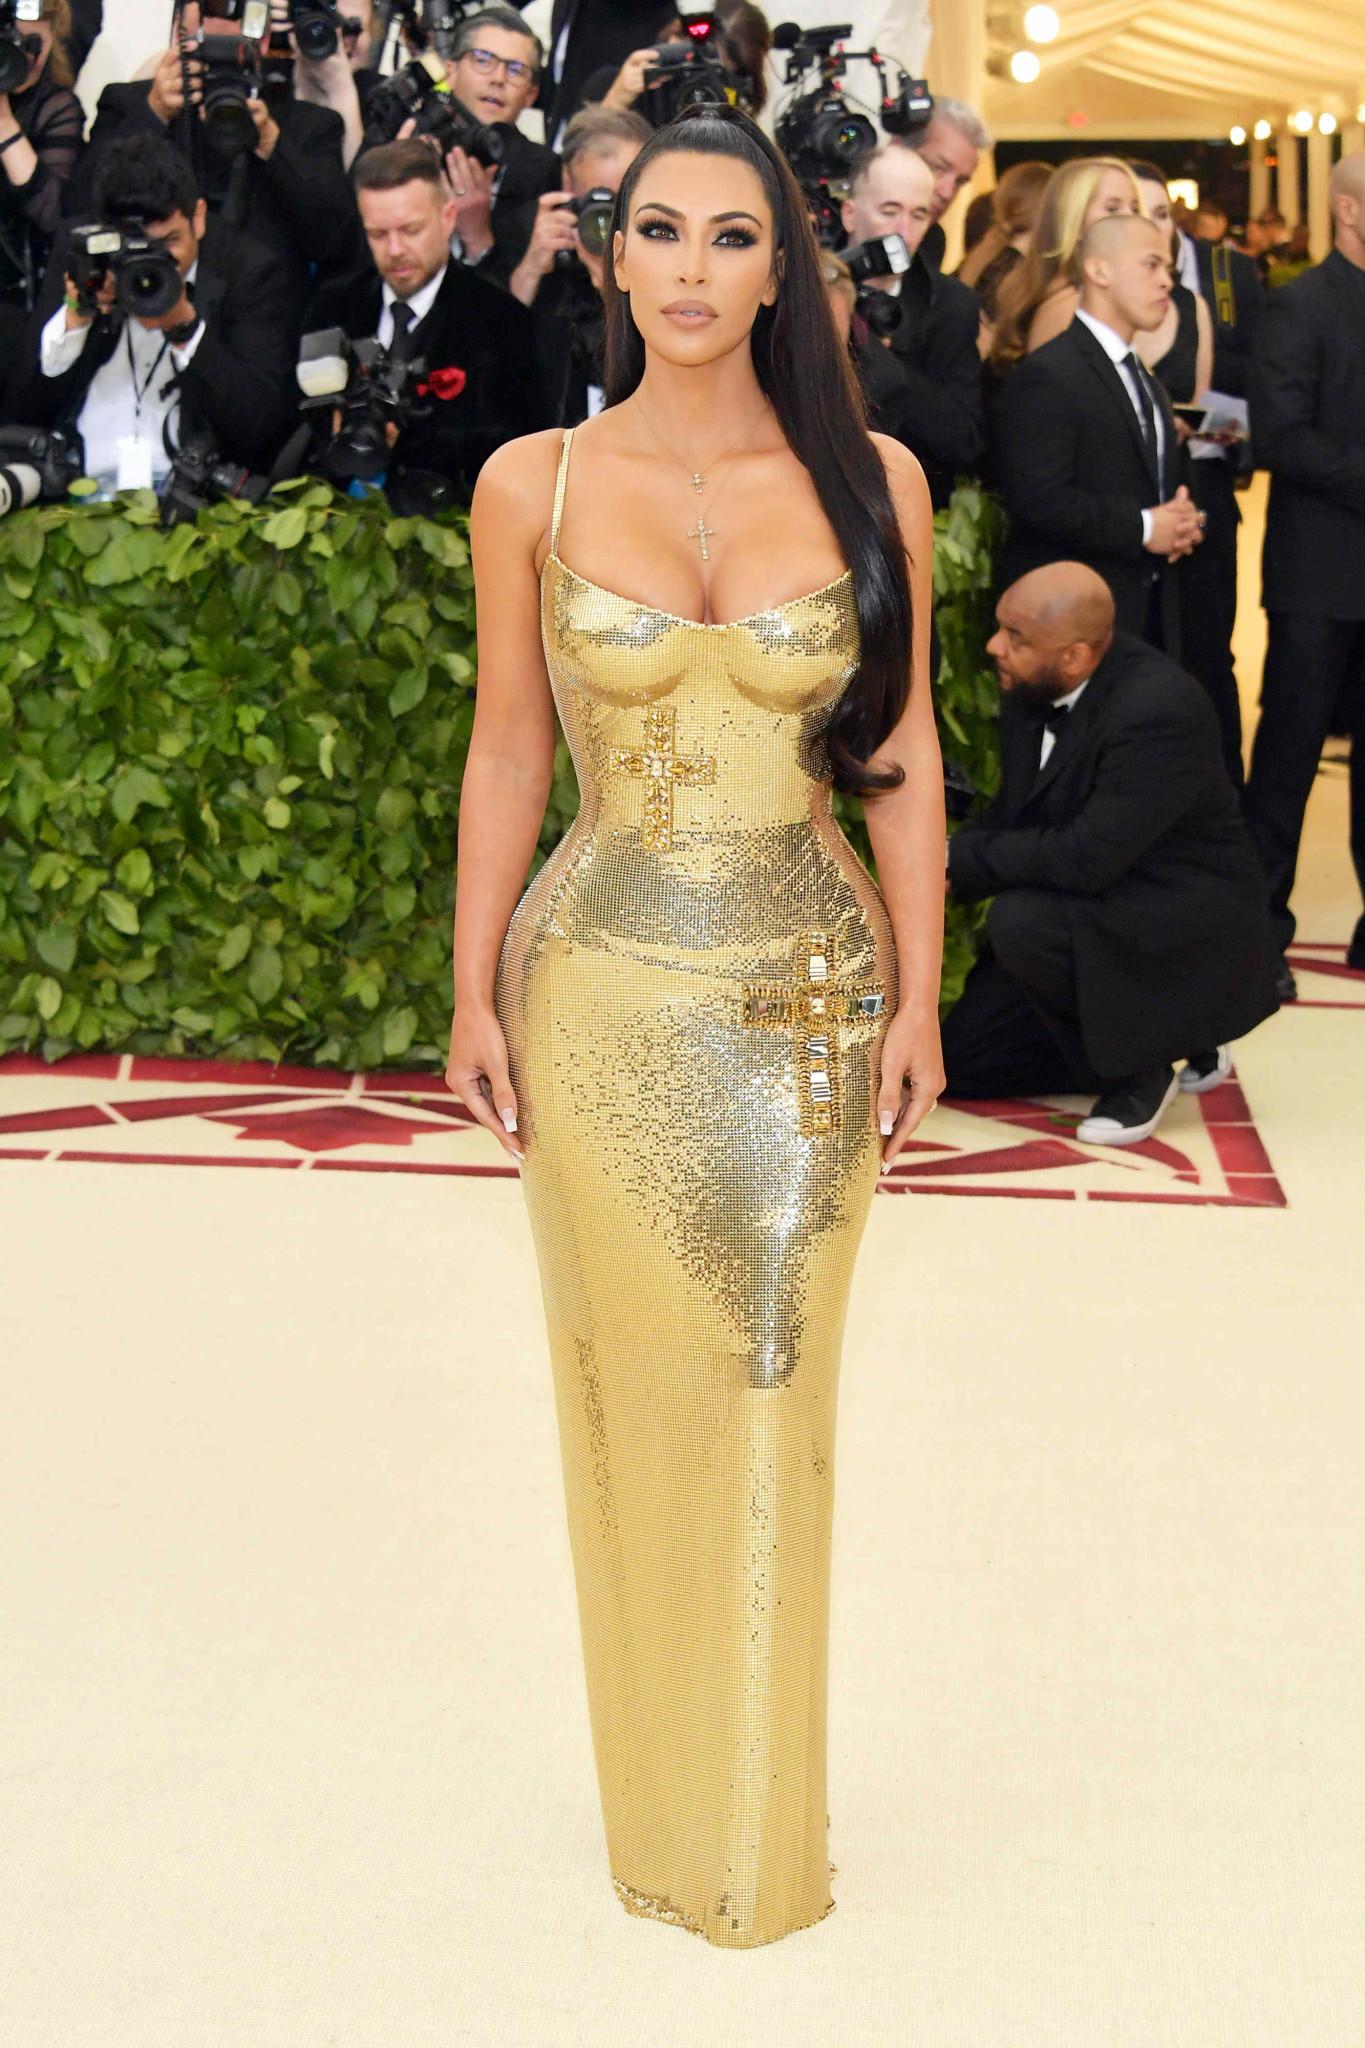 Kim Kardashian (Fotos: Divulgação/Versace)